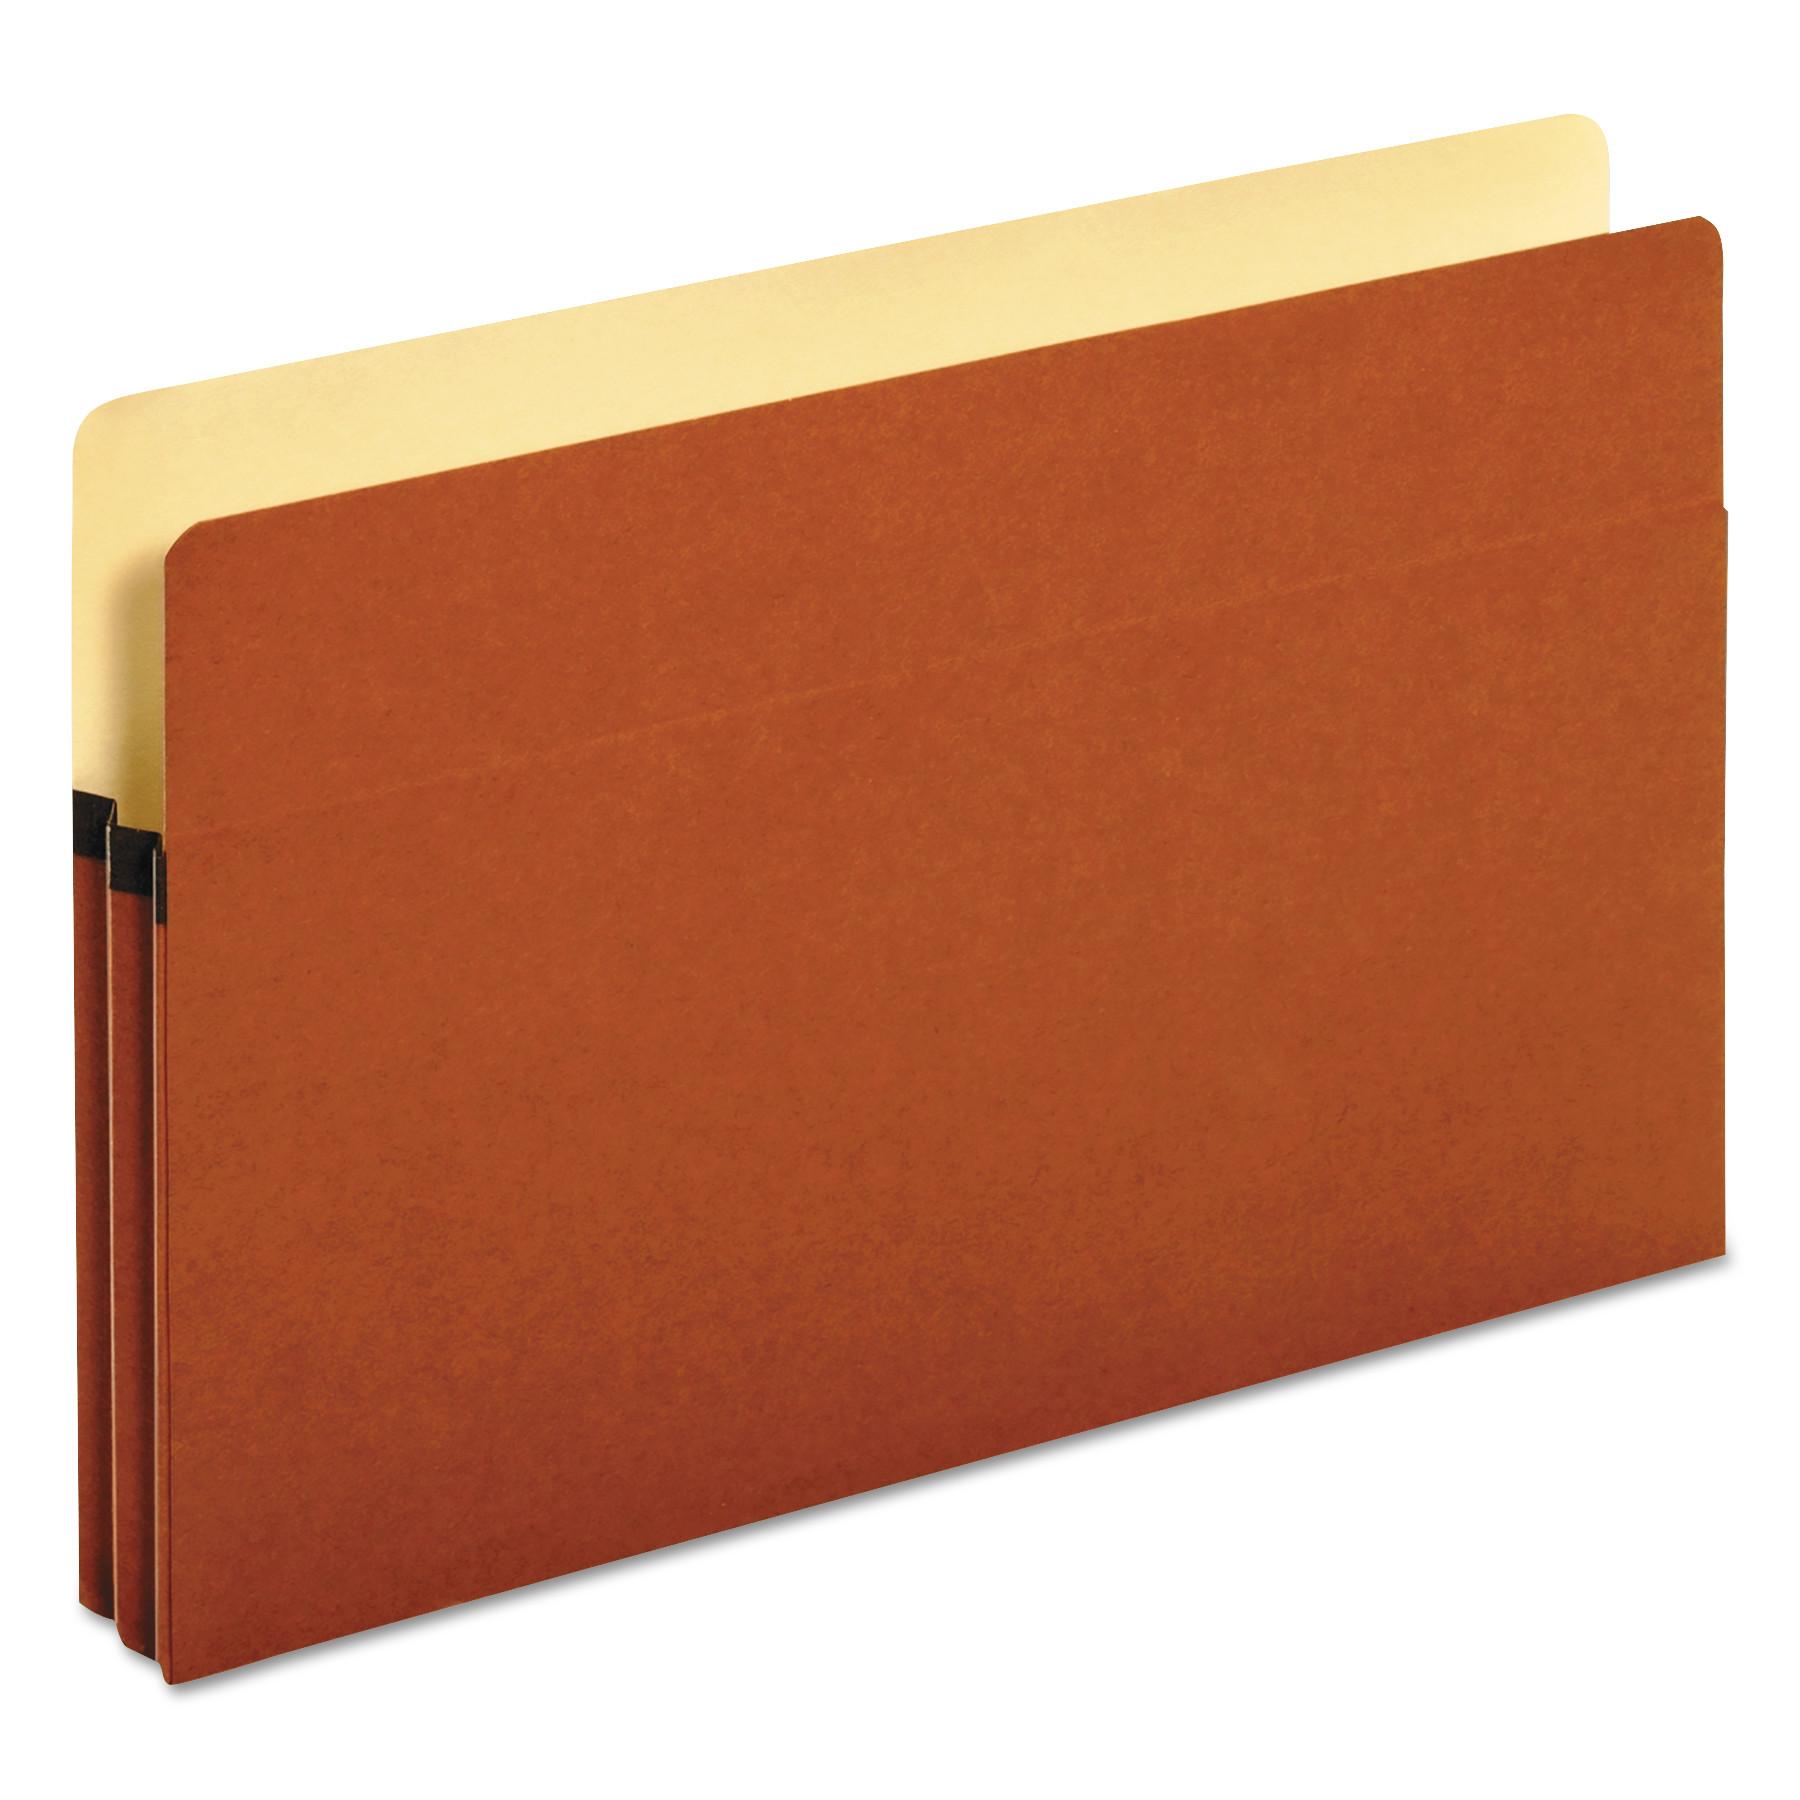 1 3/4 Inch Expansion File Pockets, Straight Tab, Legal, Redrope/Manila, 25/Box